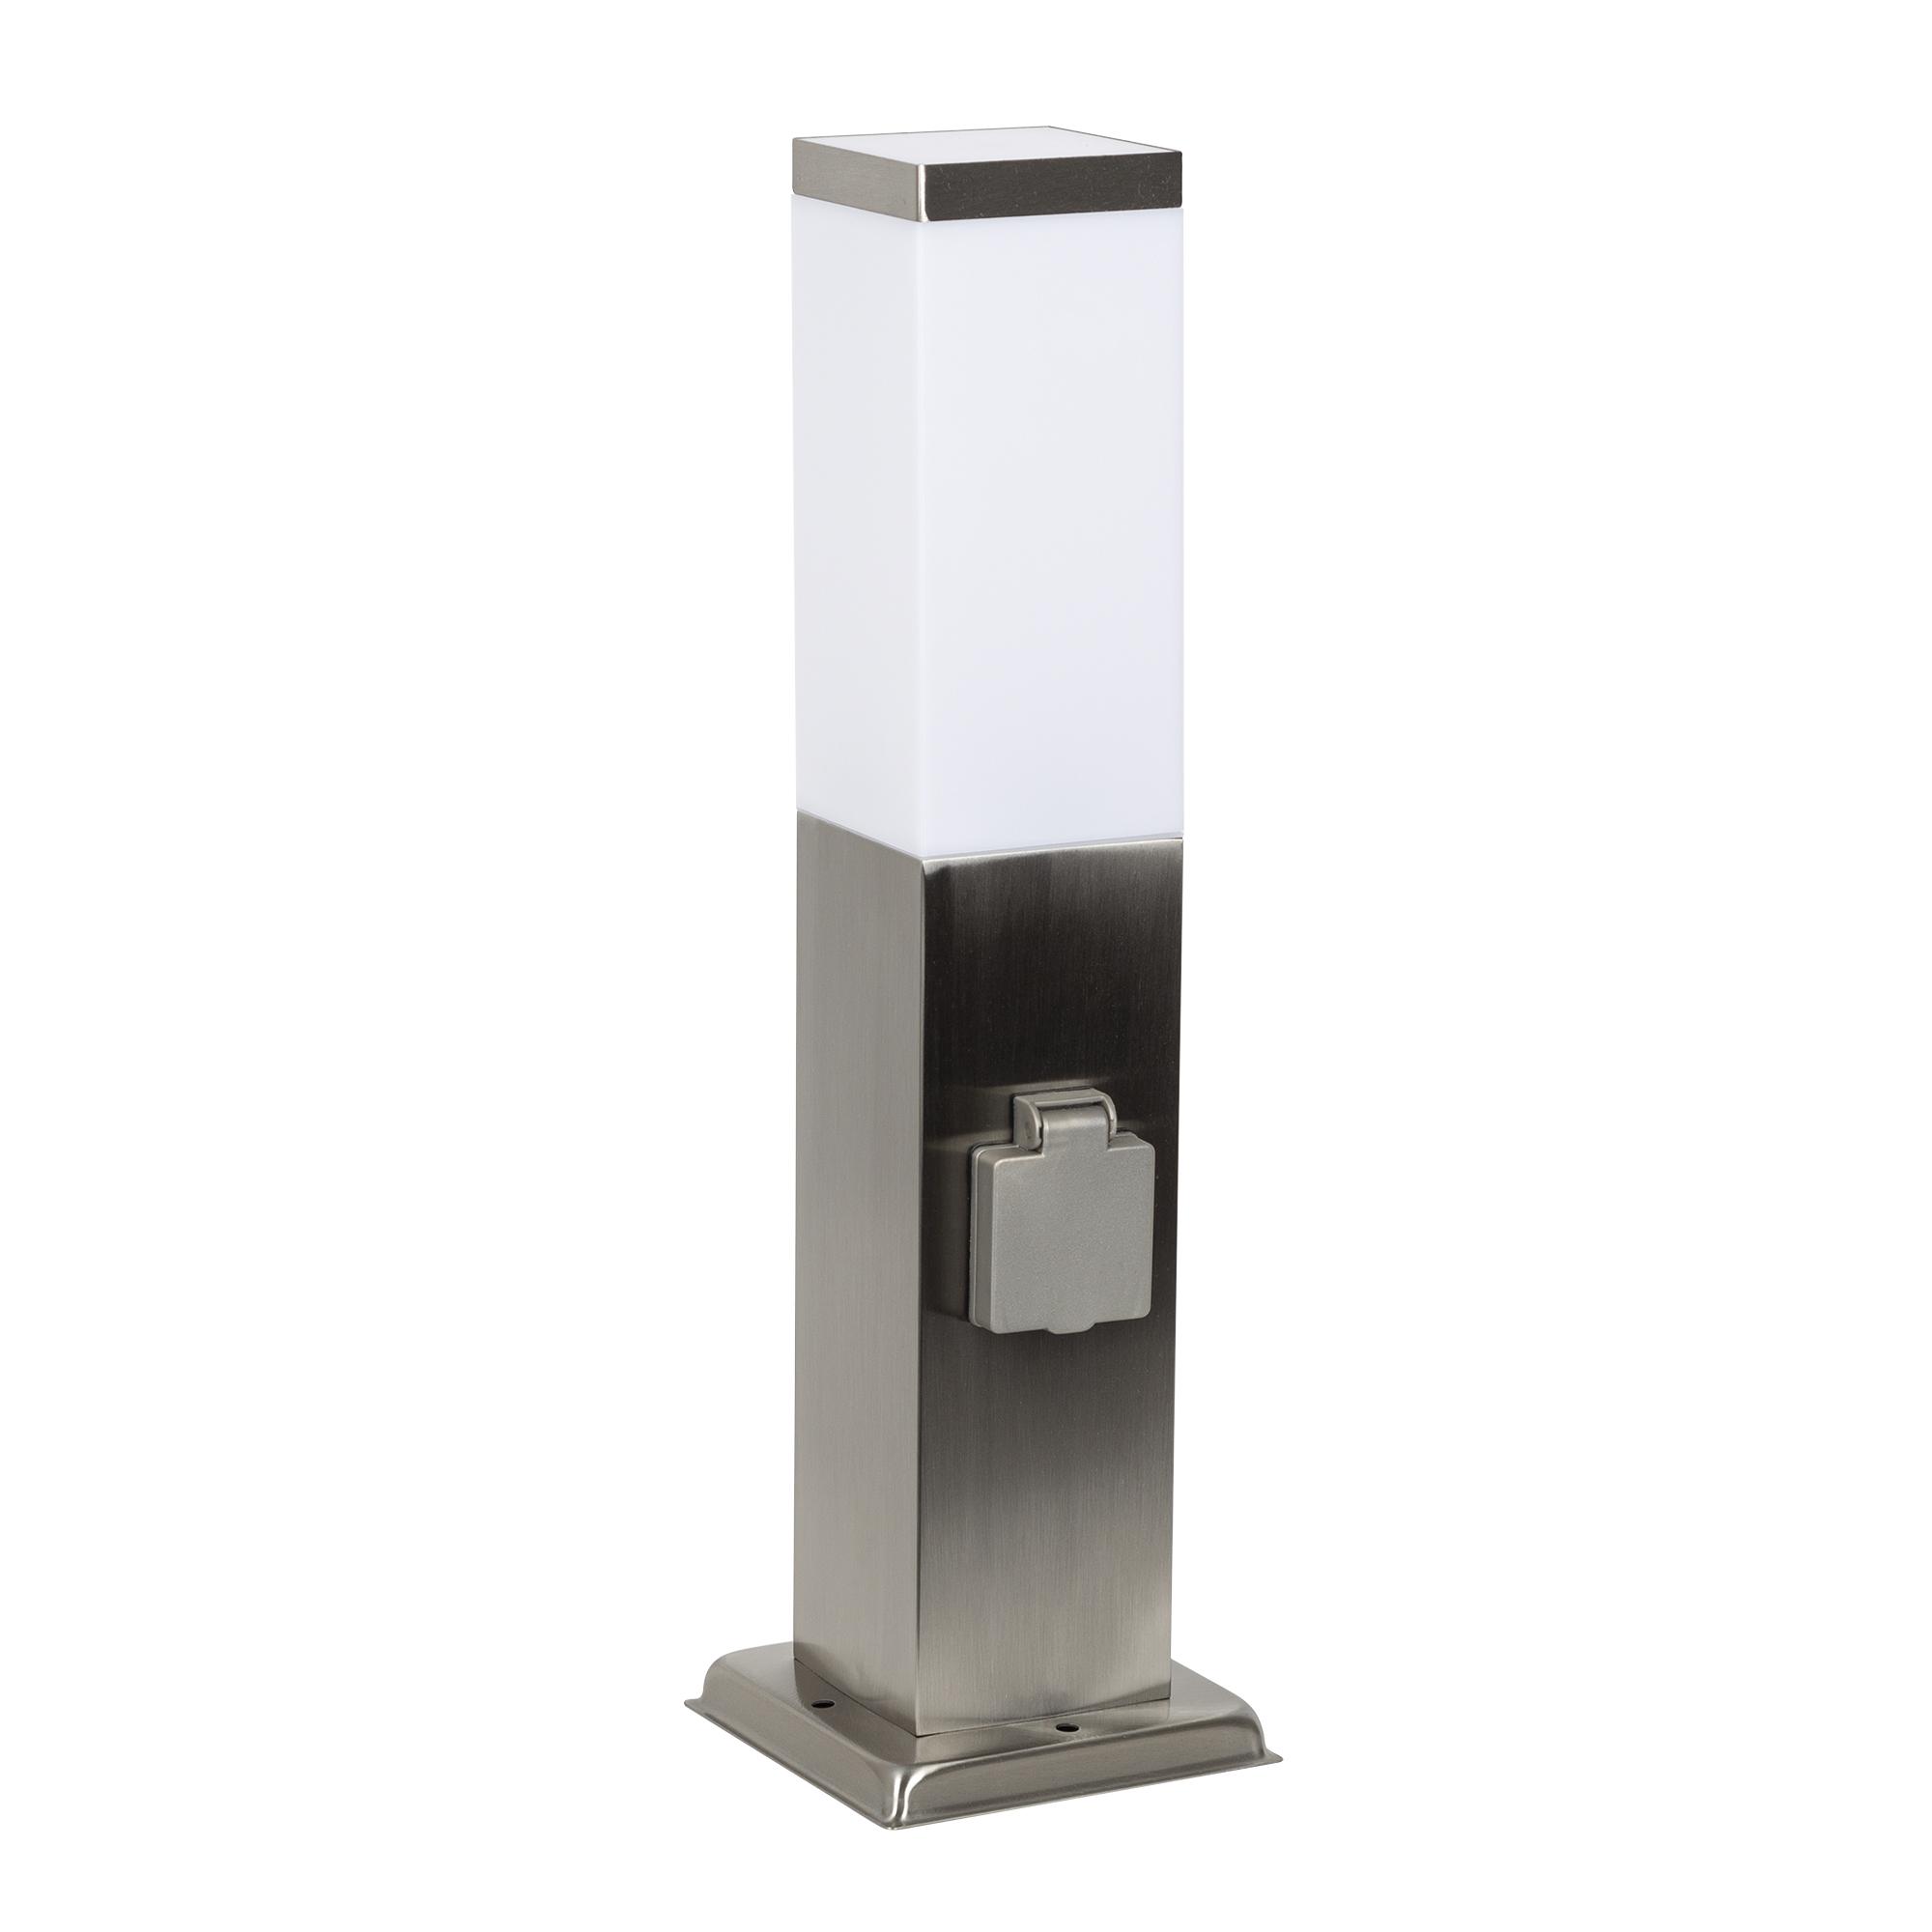 Fiss Tuinlamp met Stopcontact